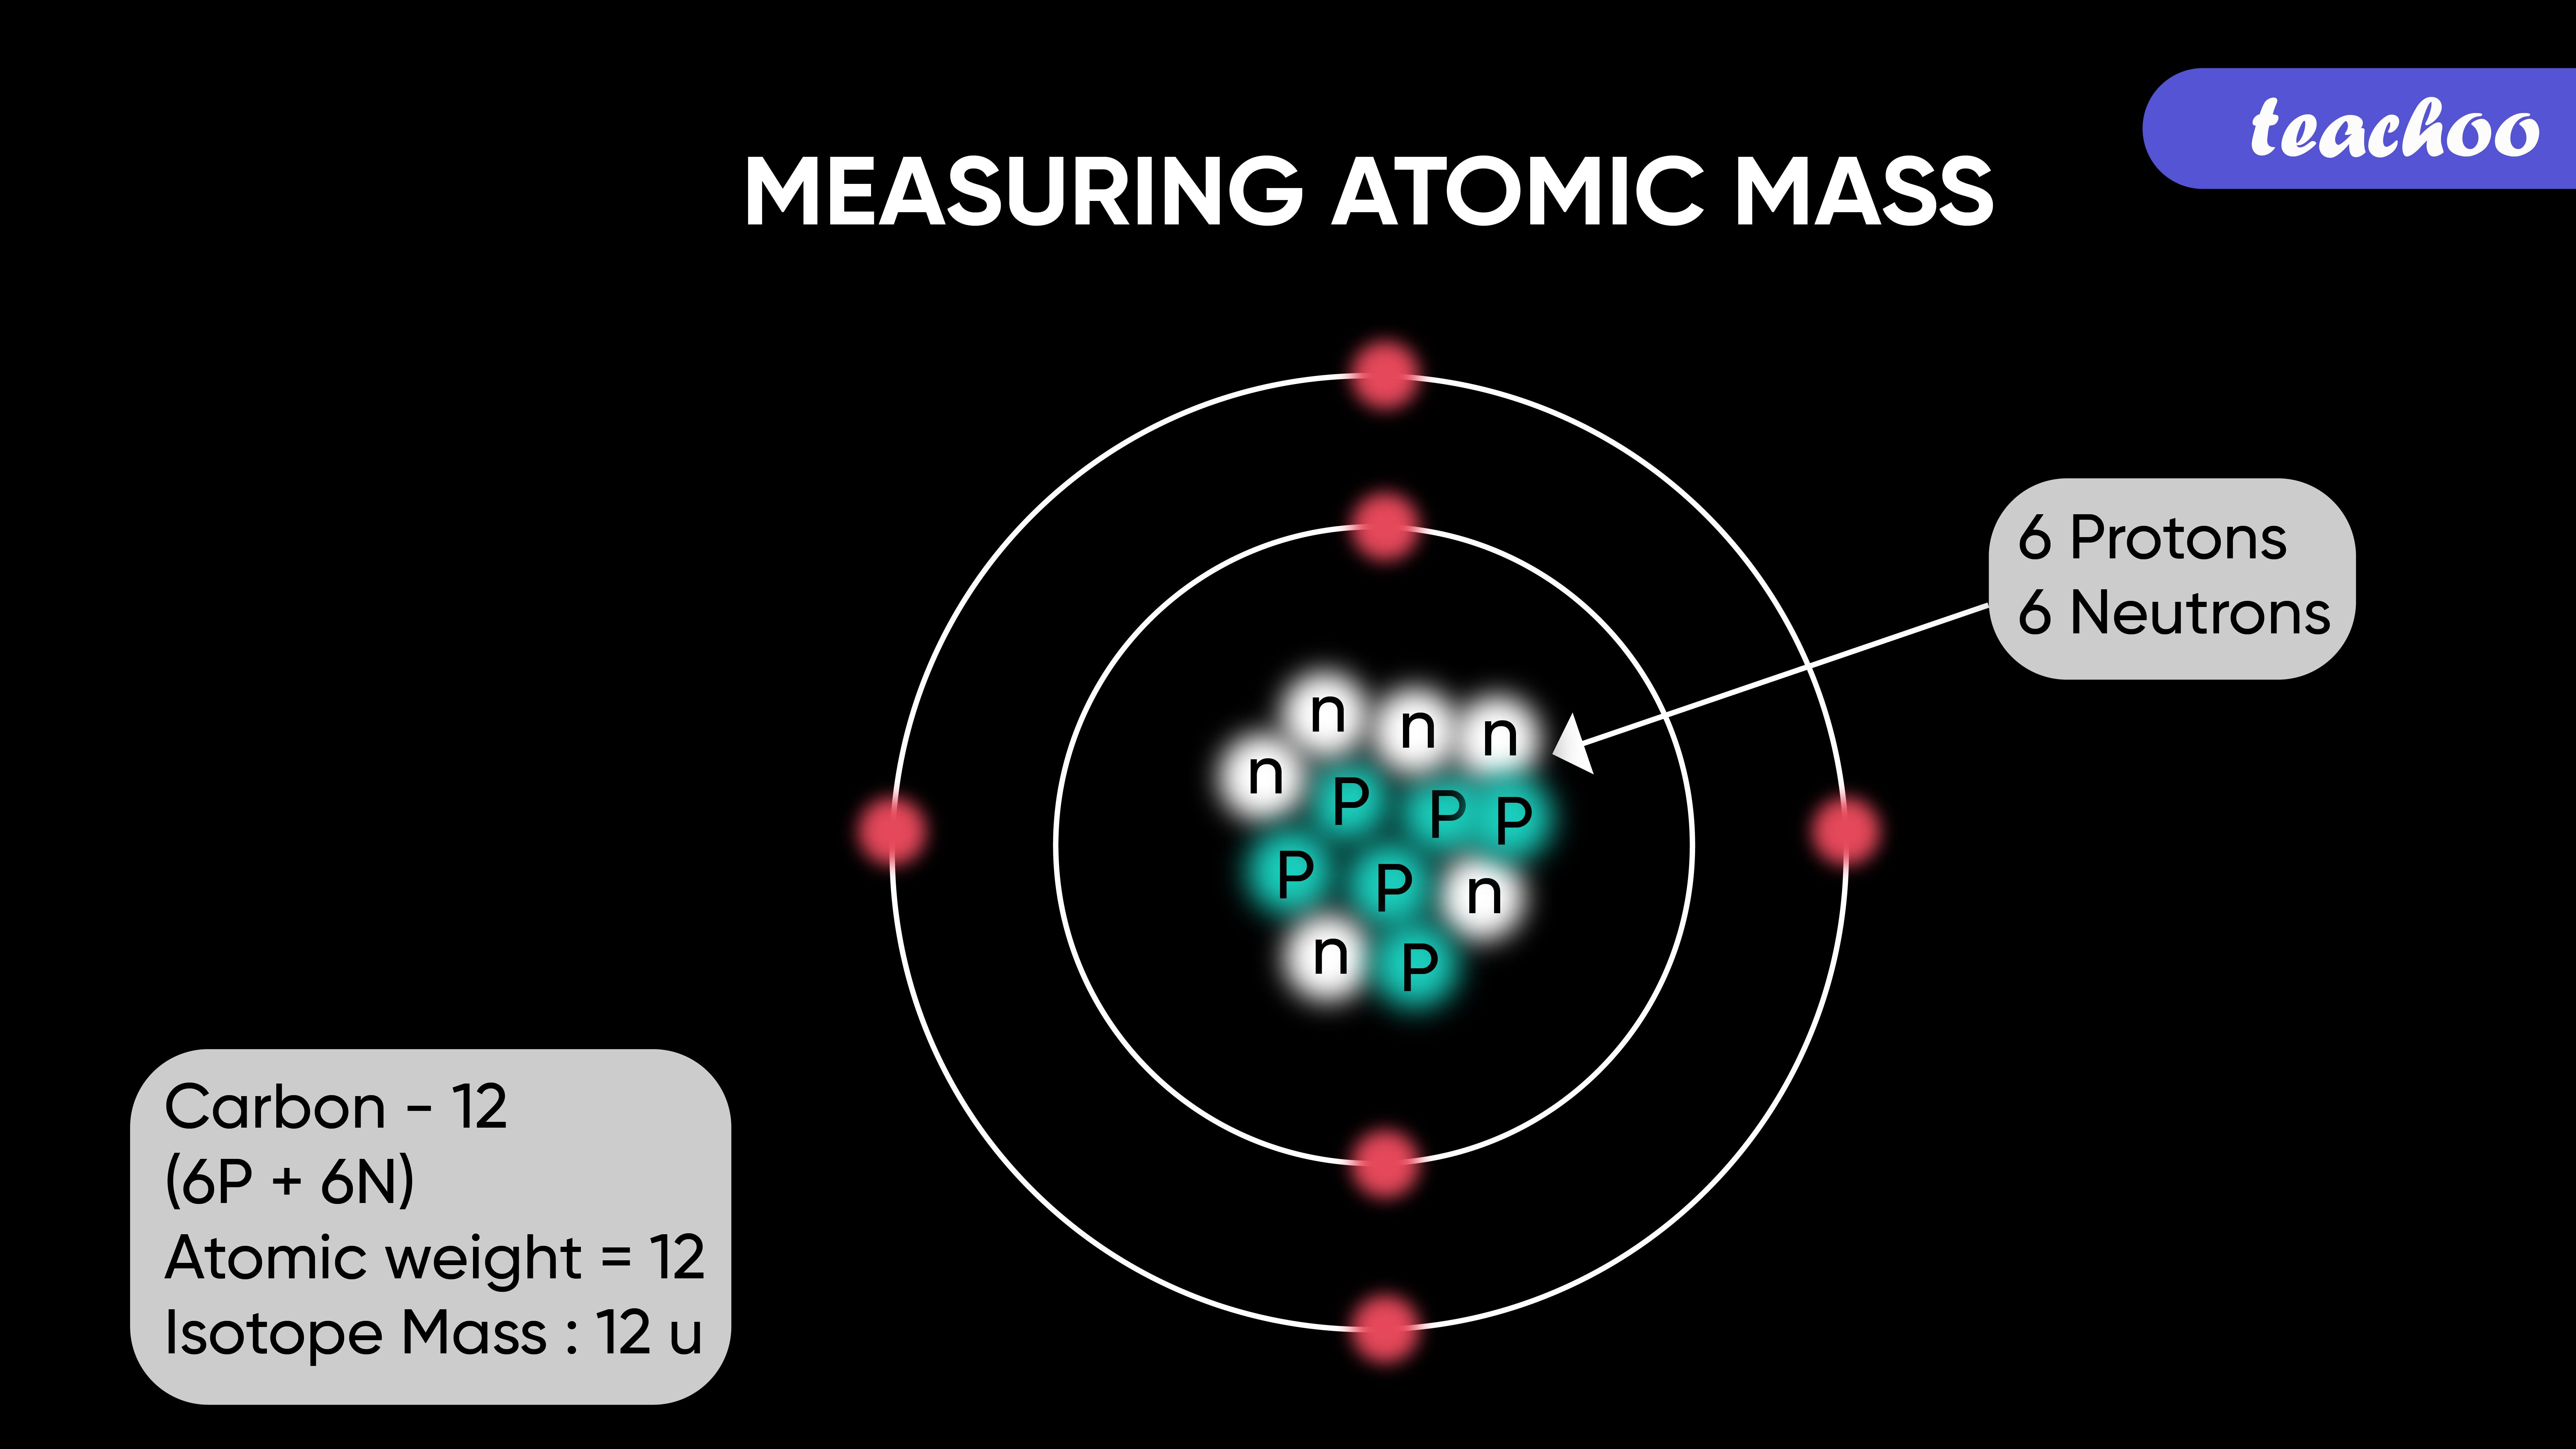 Measuring atomic mass-Teachoo-01.jpg